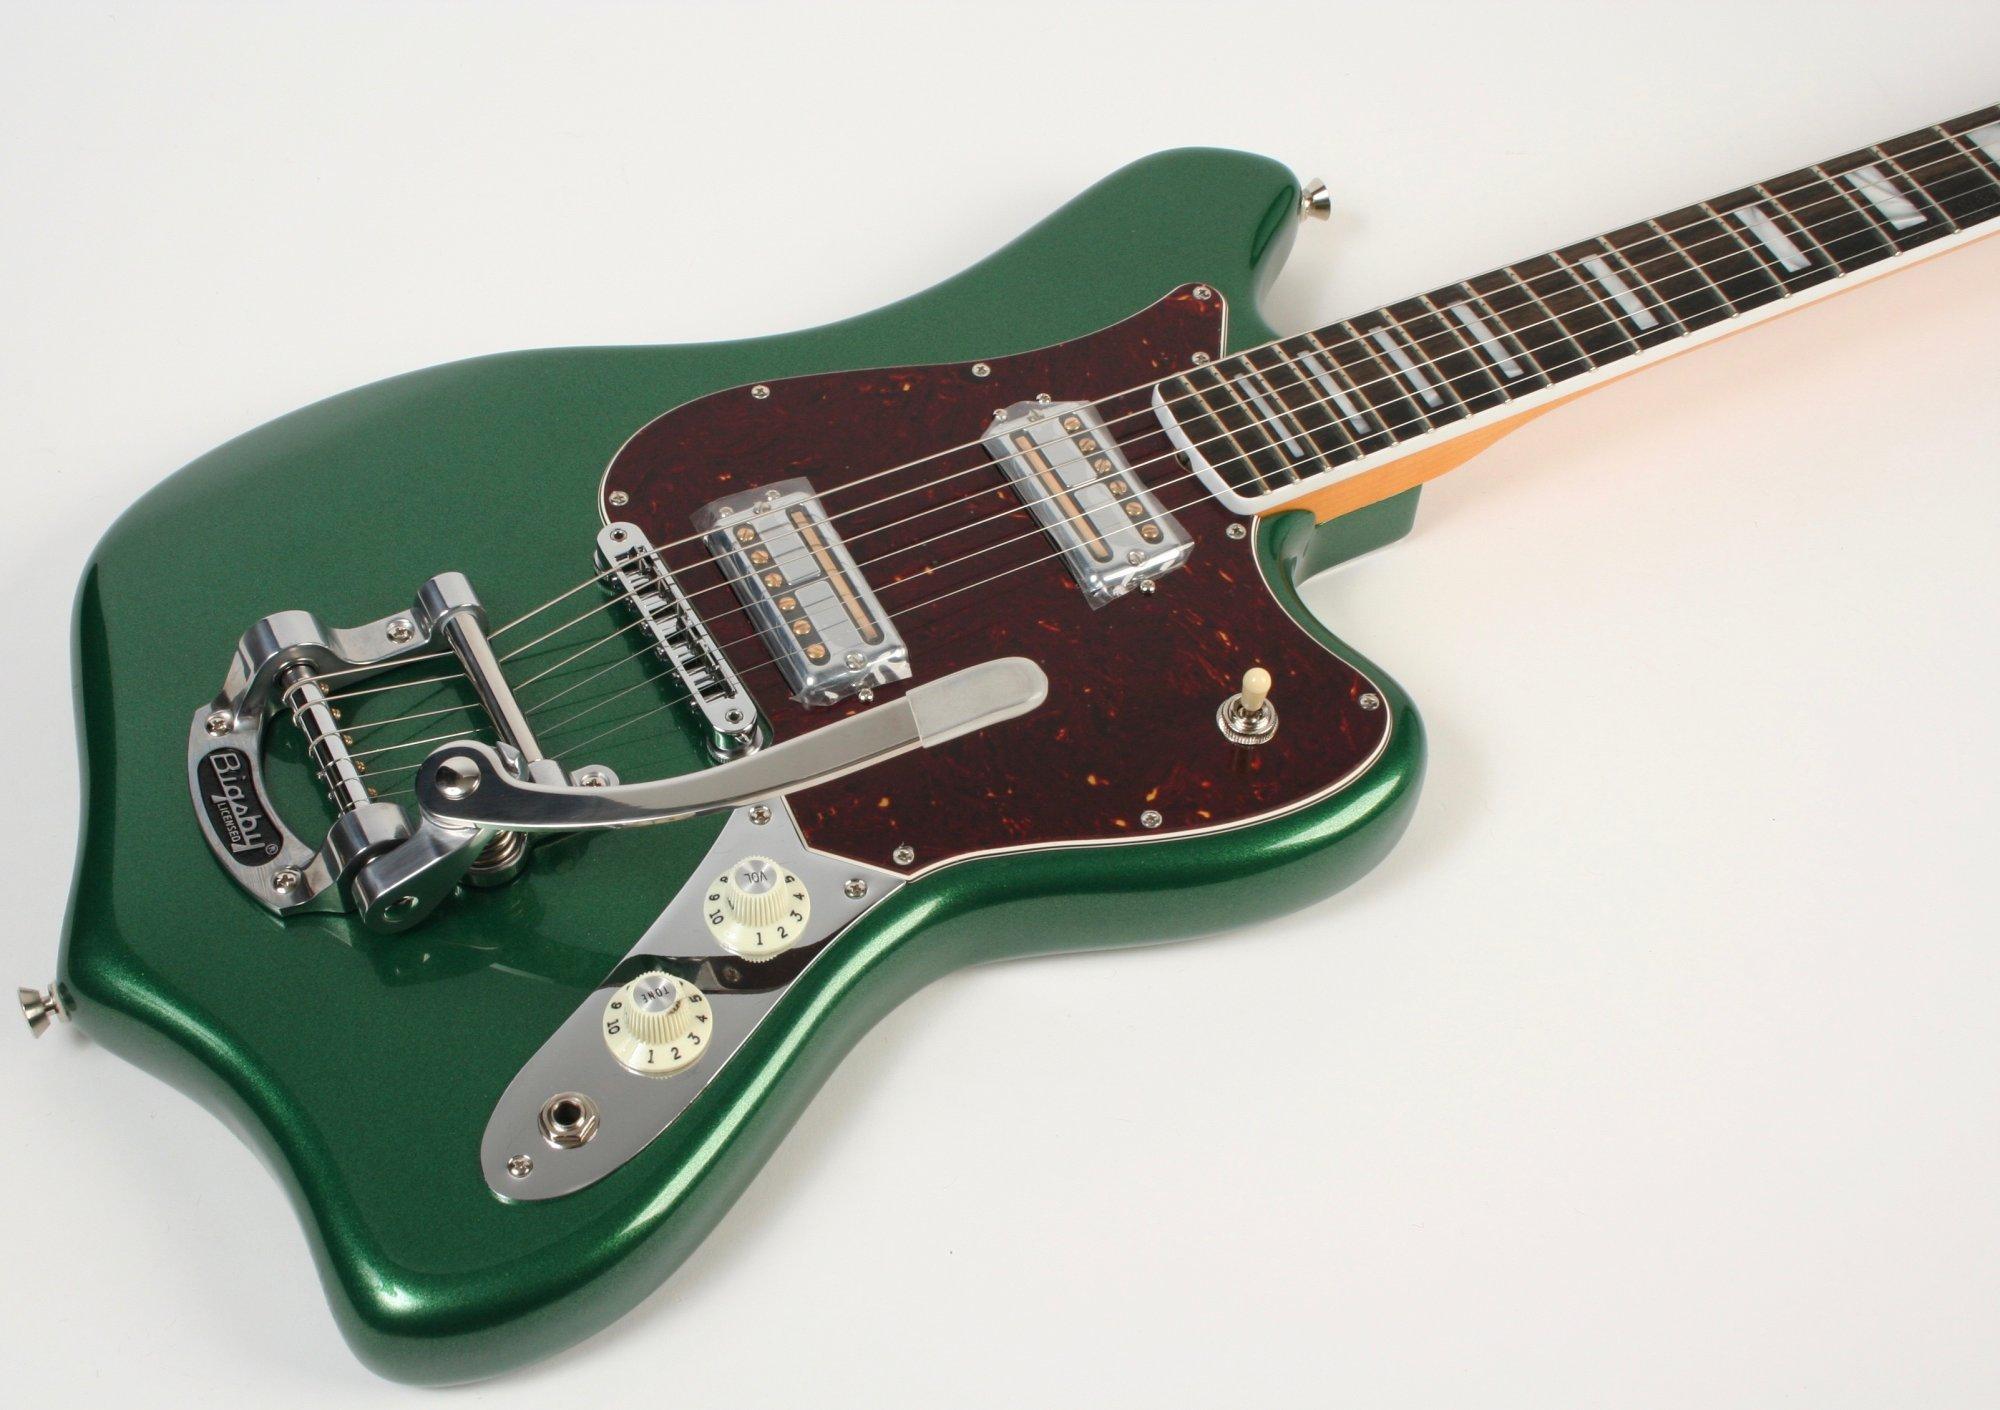 Fender Parallel Univers 2 Maverick Mystic Pine Green